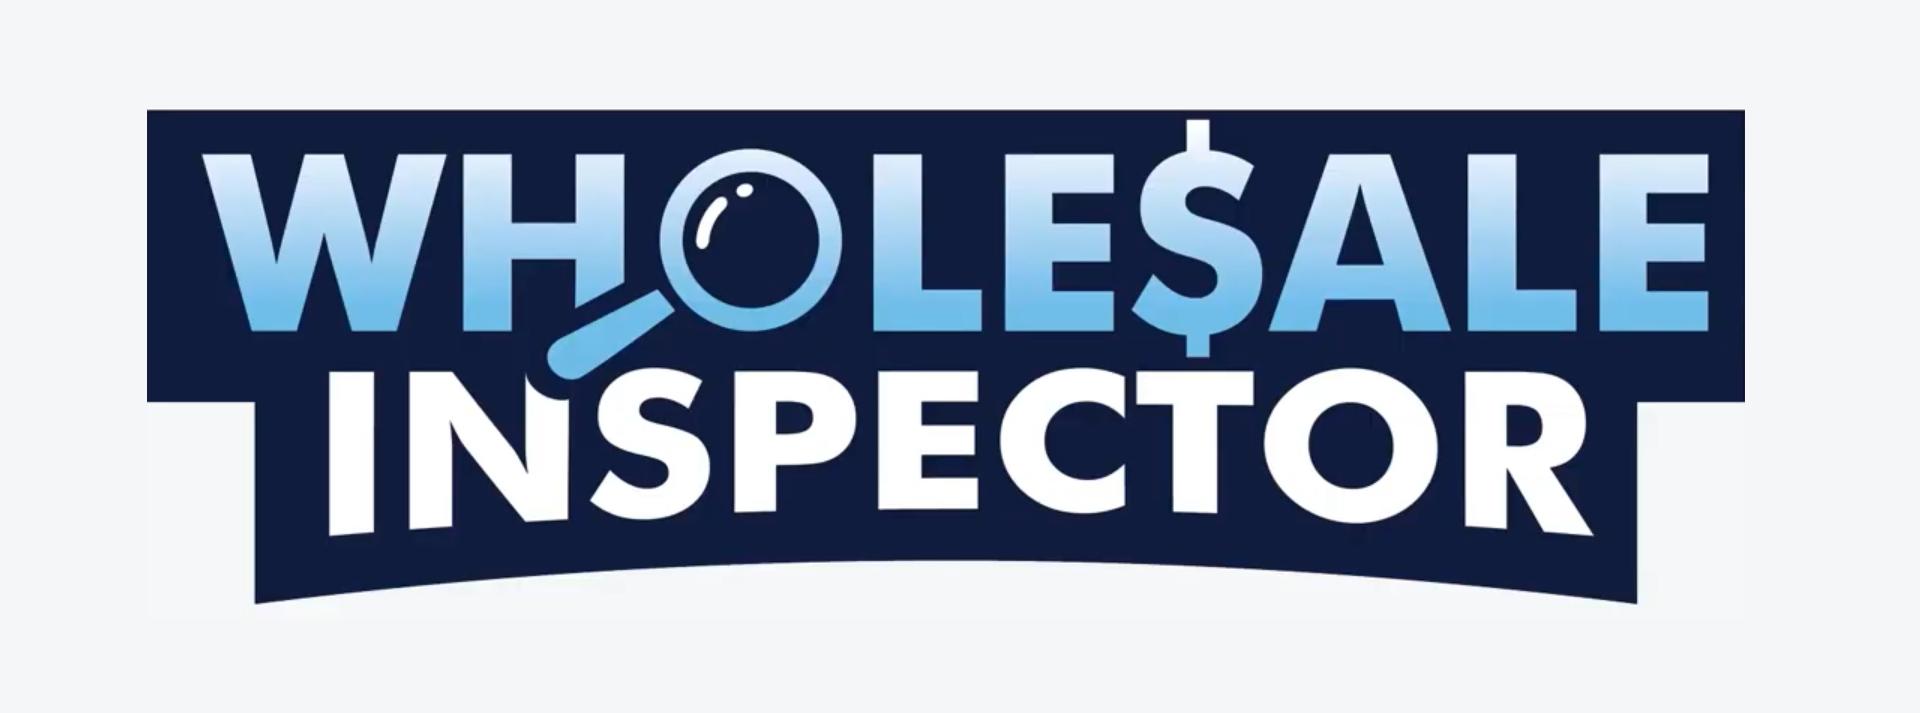 wholesale-inspector-logo2